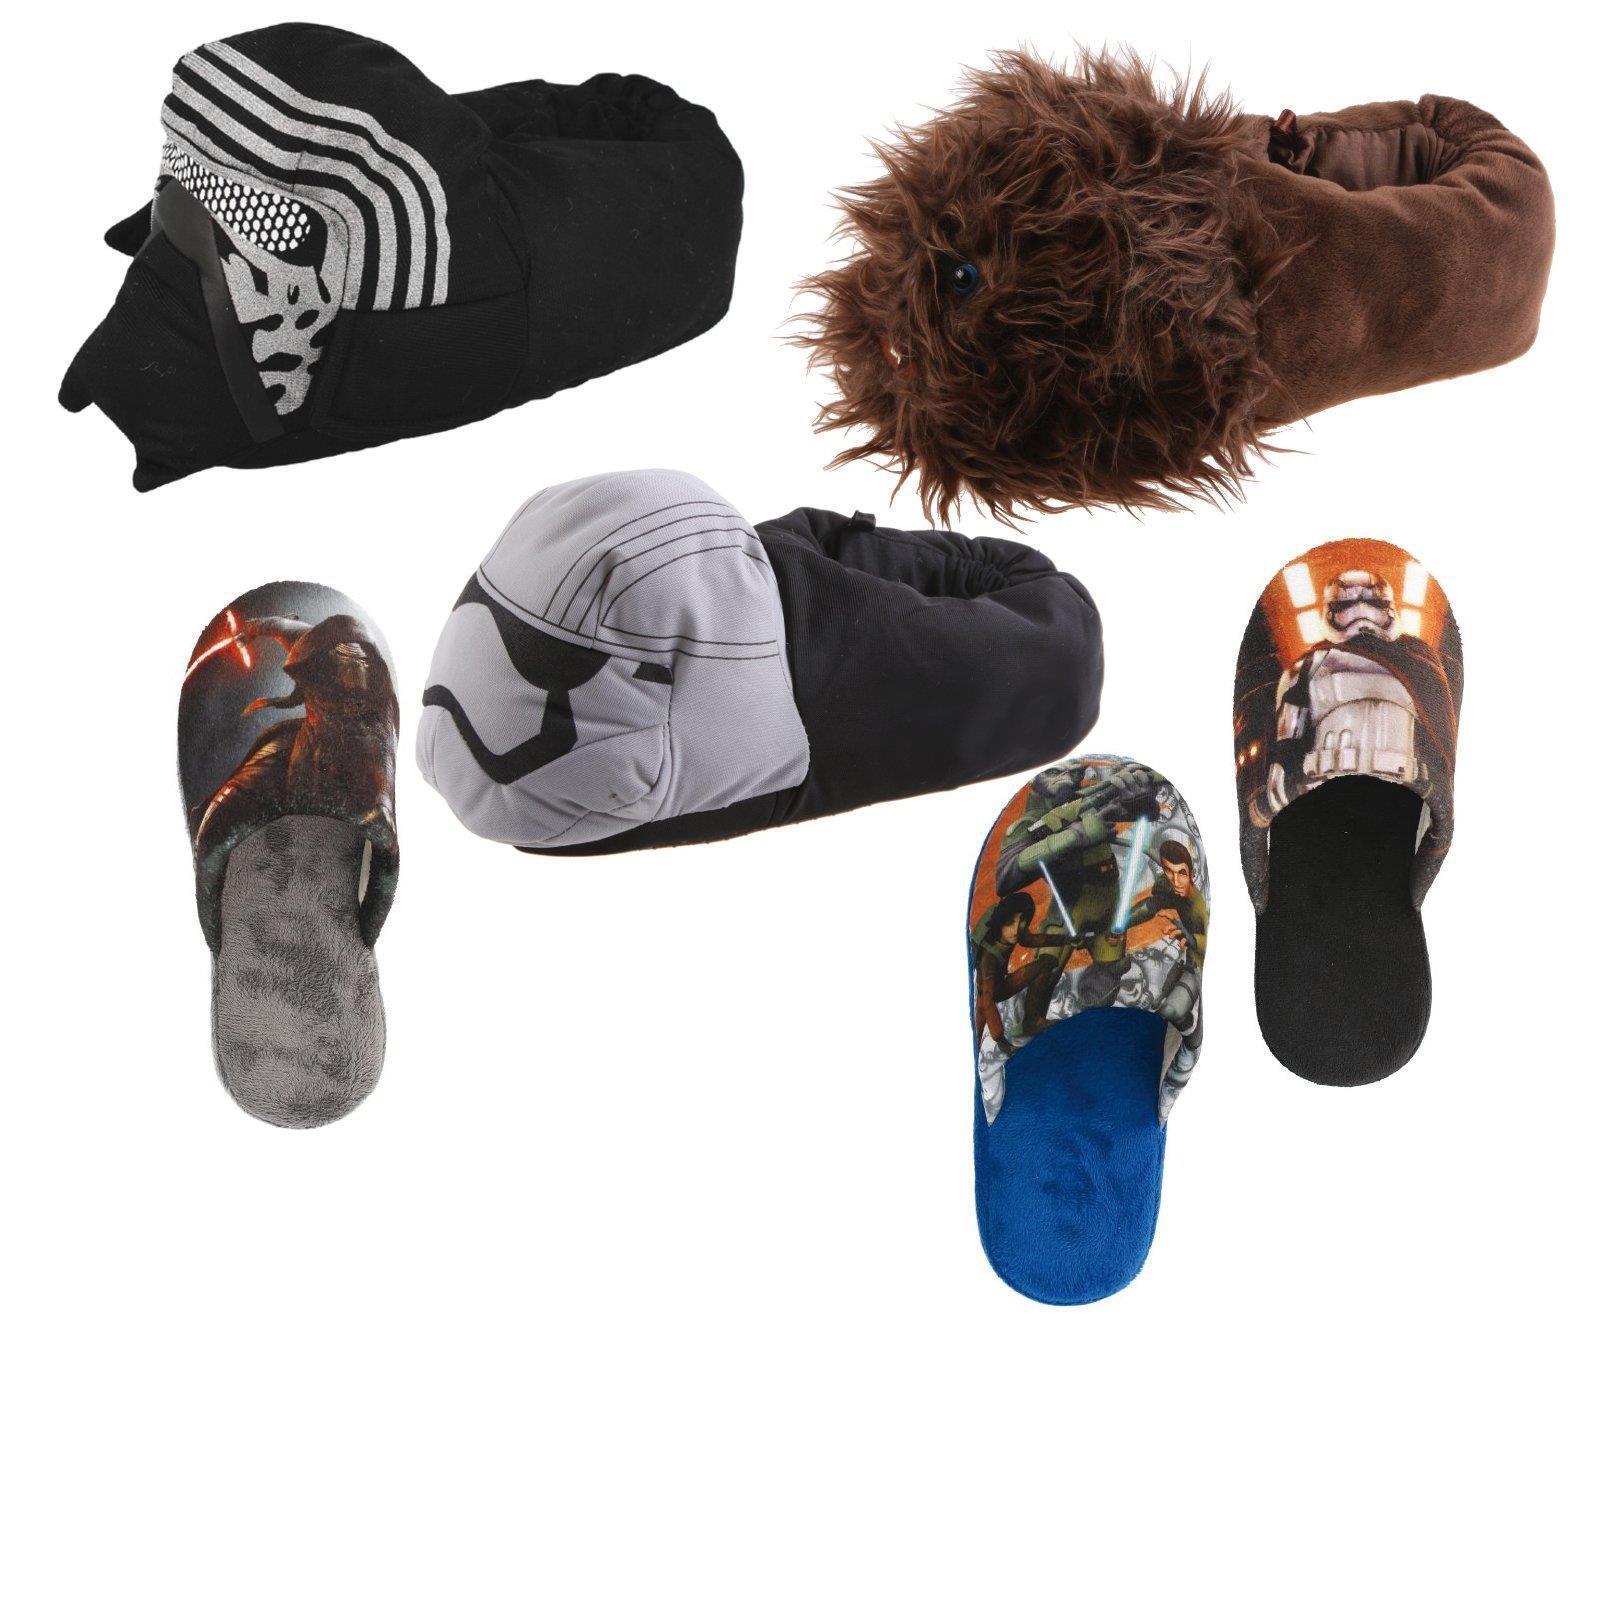 Mens Rockport Mocasin Loafer Suede IndoorOutdoor Slippers Brown Size 12 NWBox